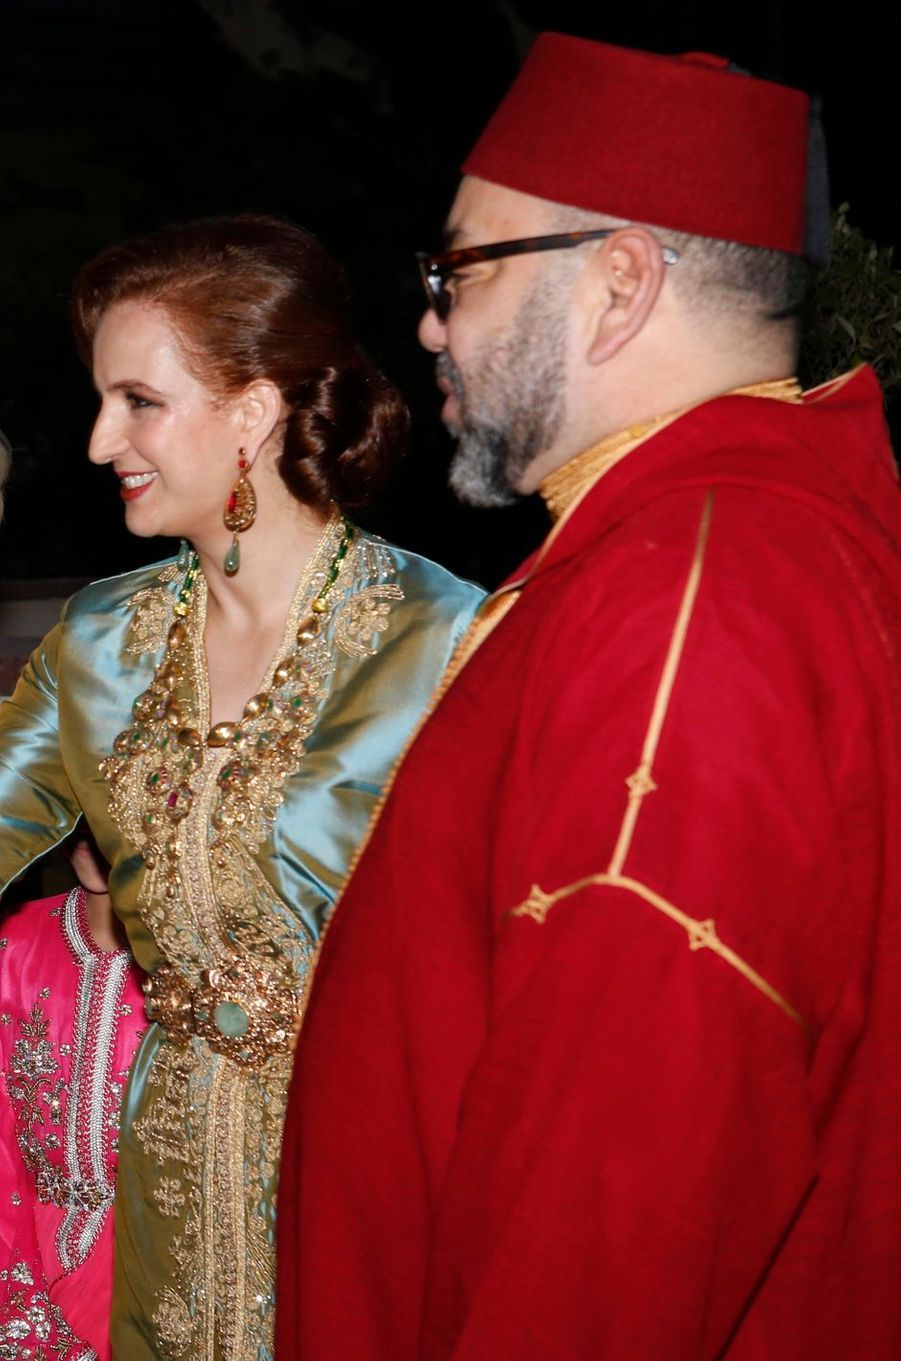 La princesse Lalla Salma et le roi Mohammed VI du Maroc le 4 juin 2017